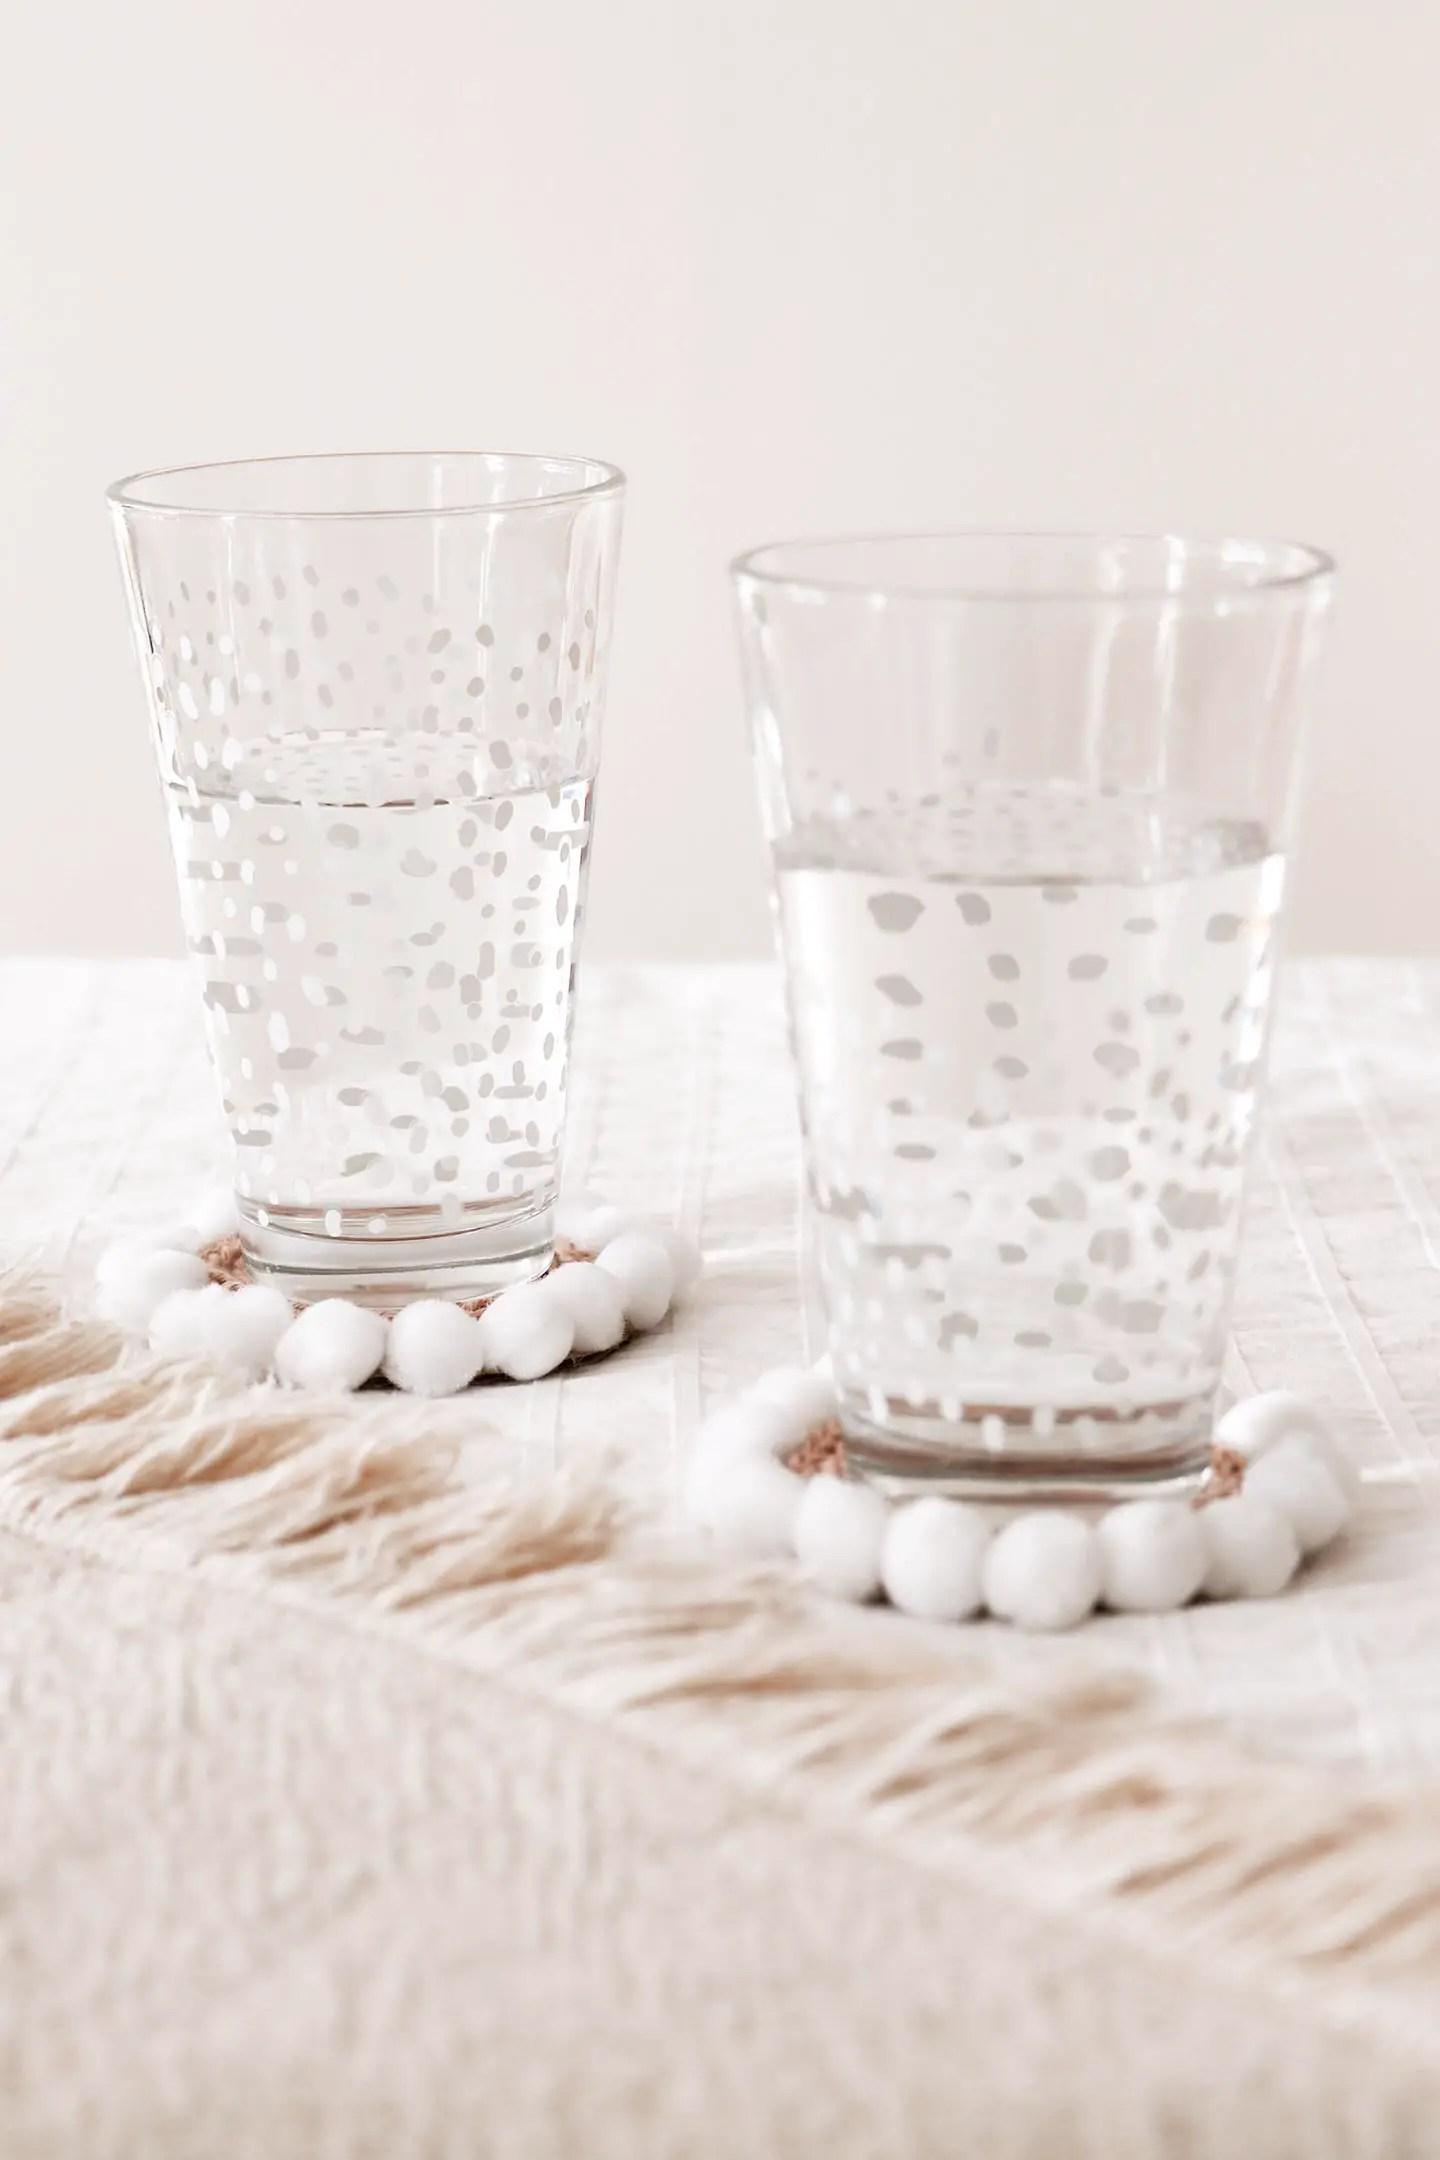 DIY tricotin : sous-verres